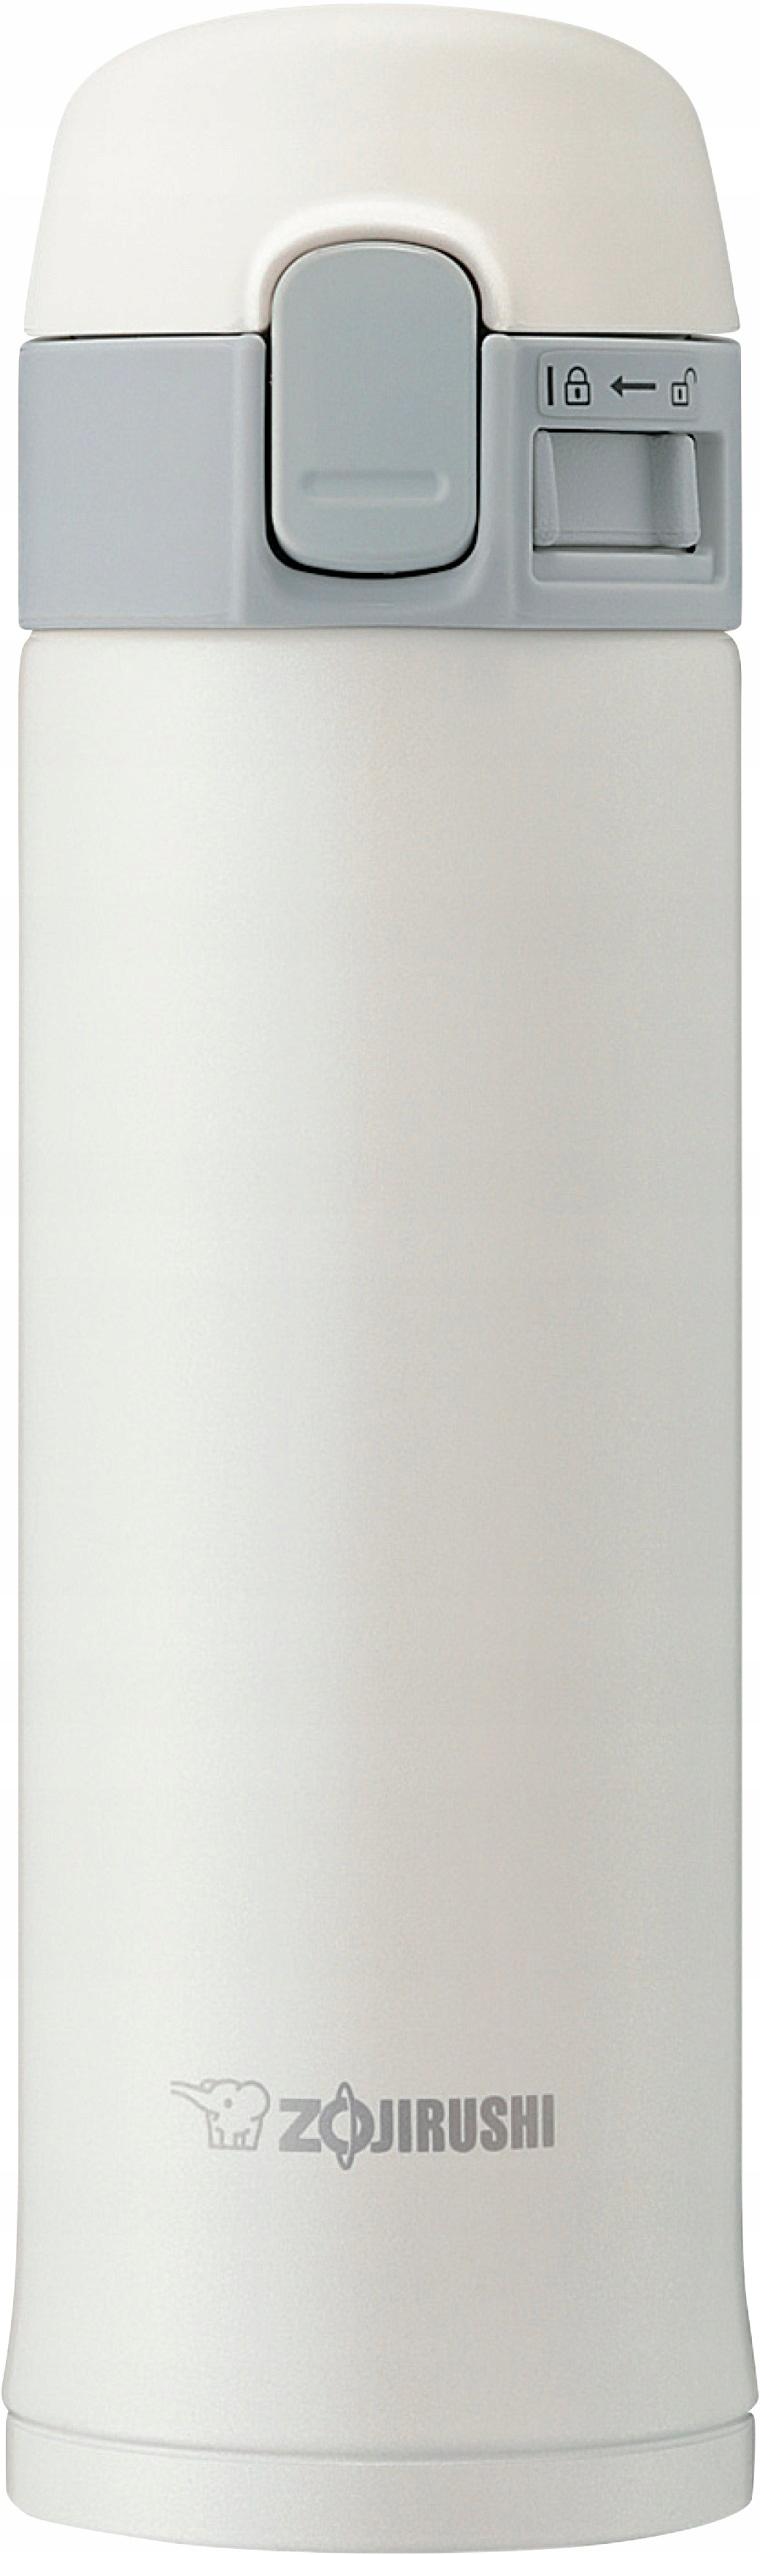 Термокружка, термос ZOJIRUSHI SM-PC30, 300 мл